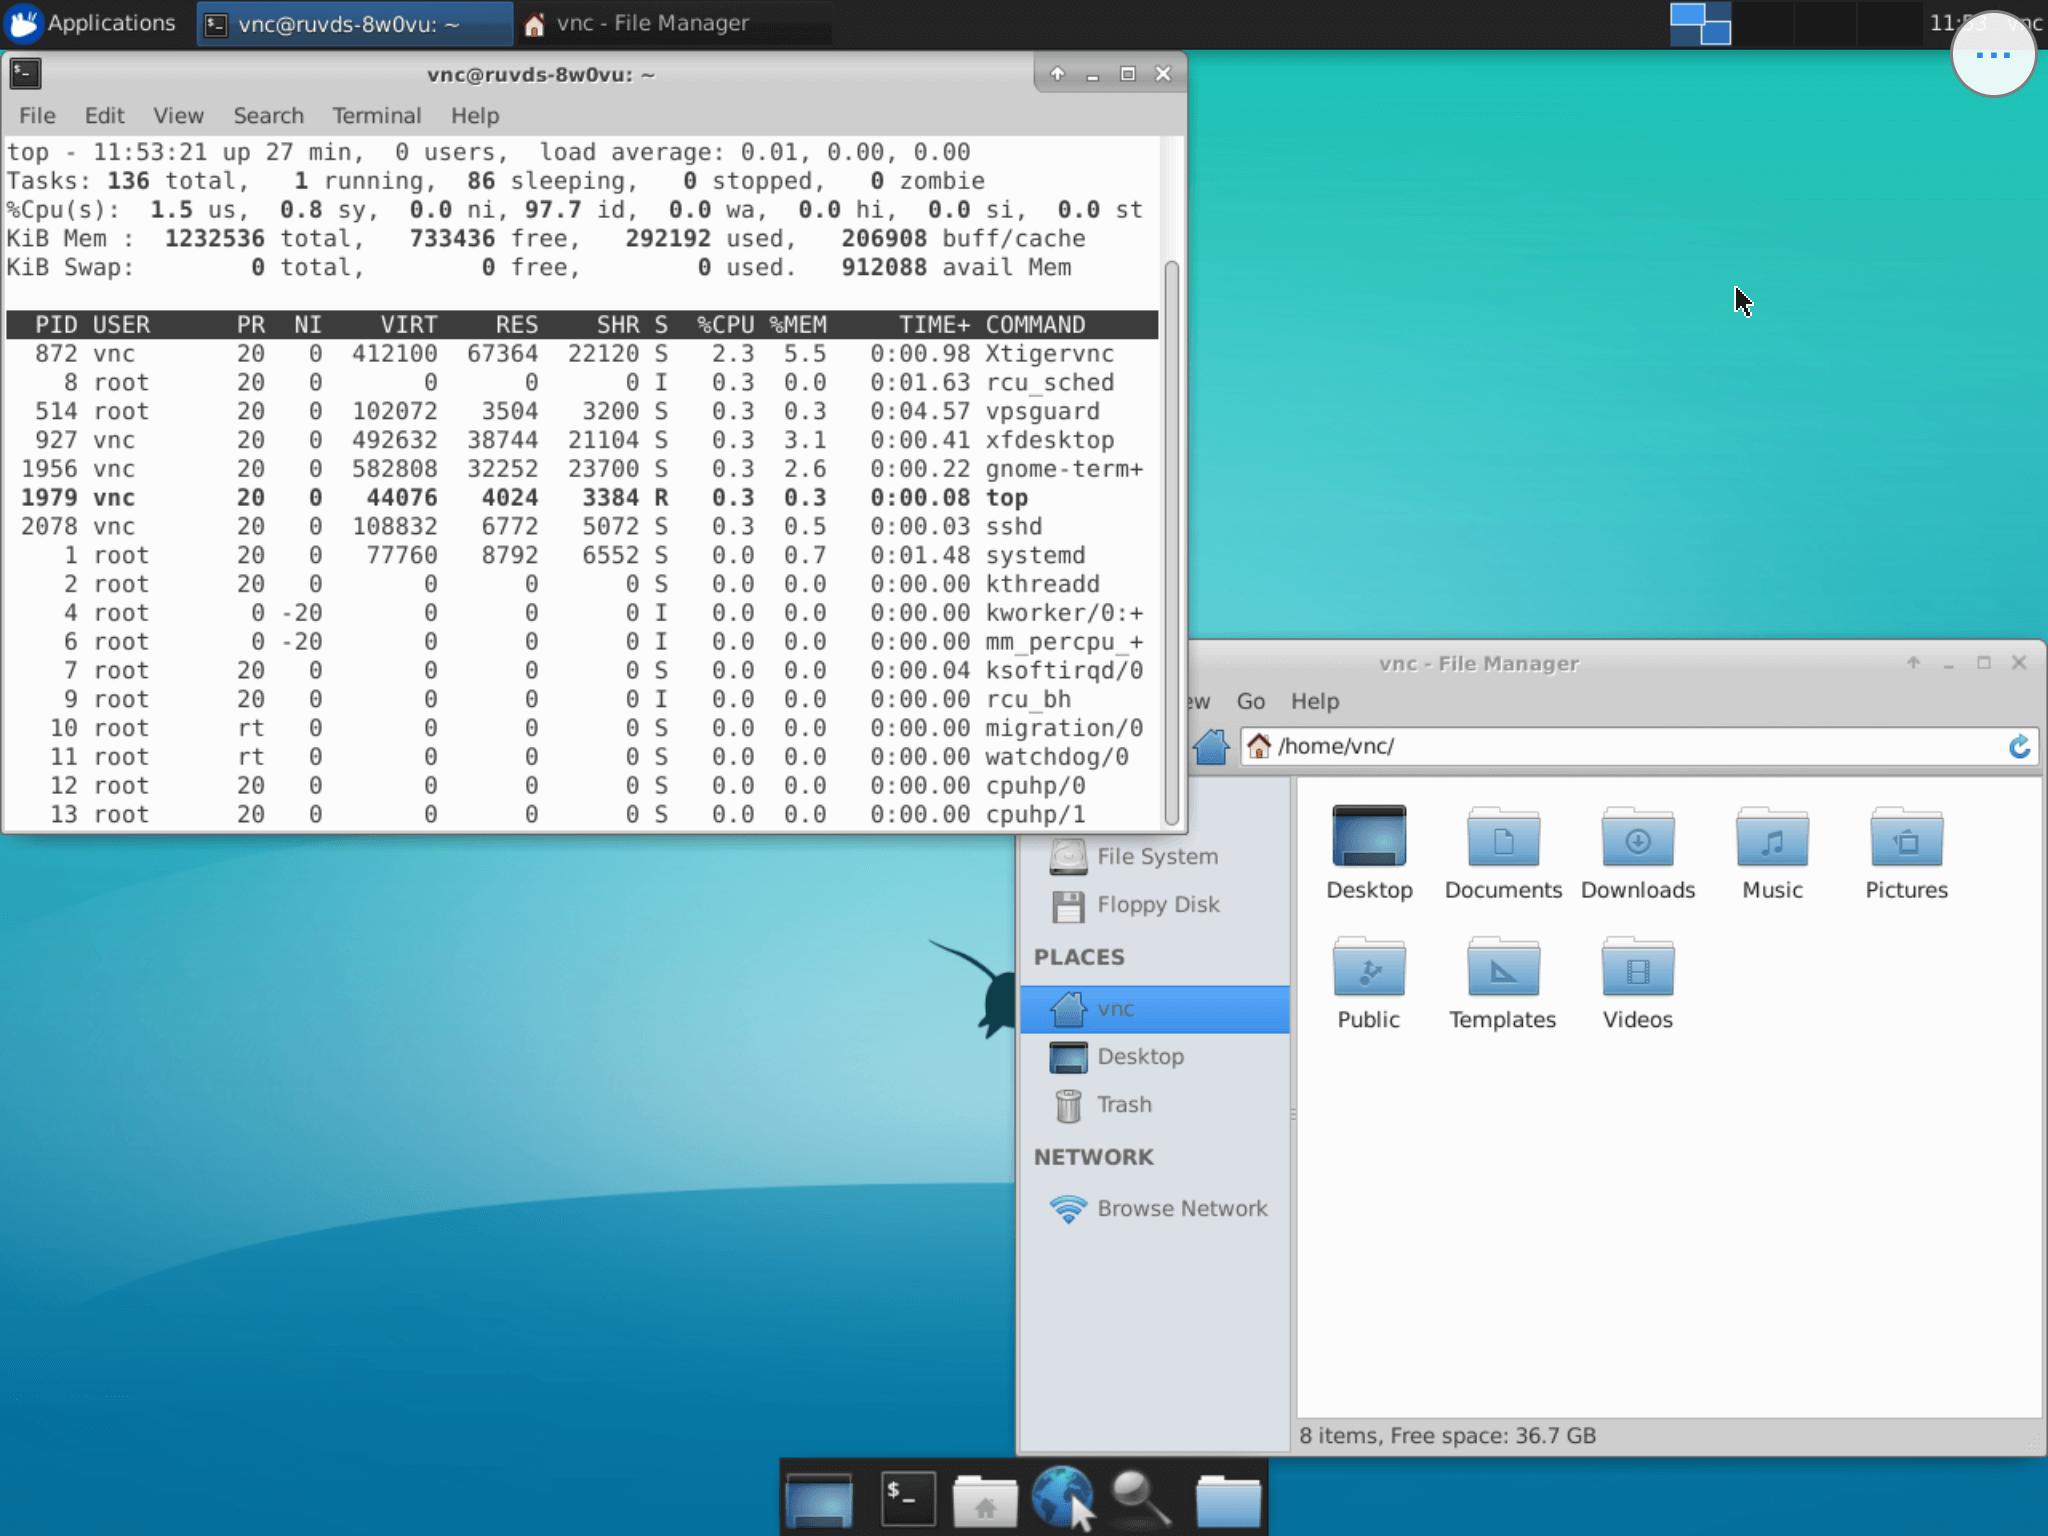 VPS на Linux с графическим интерфейсом: запускаем сервер VNC на Ubuntu 18.04 - 8